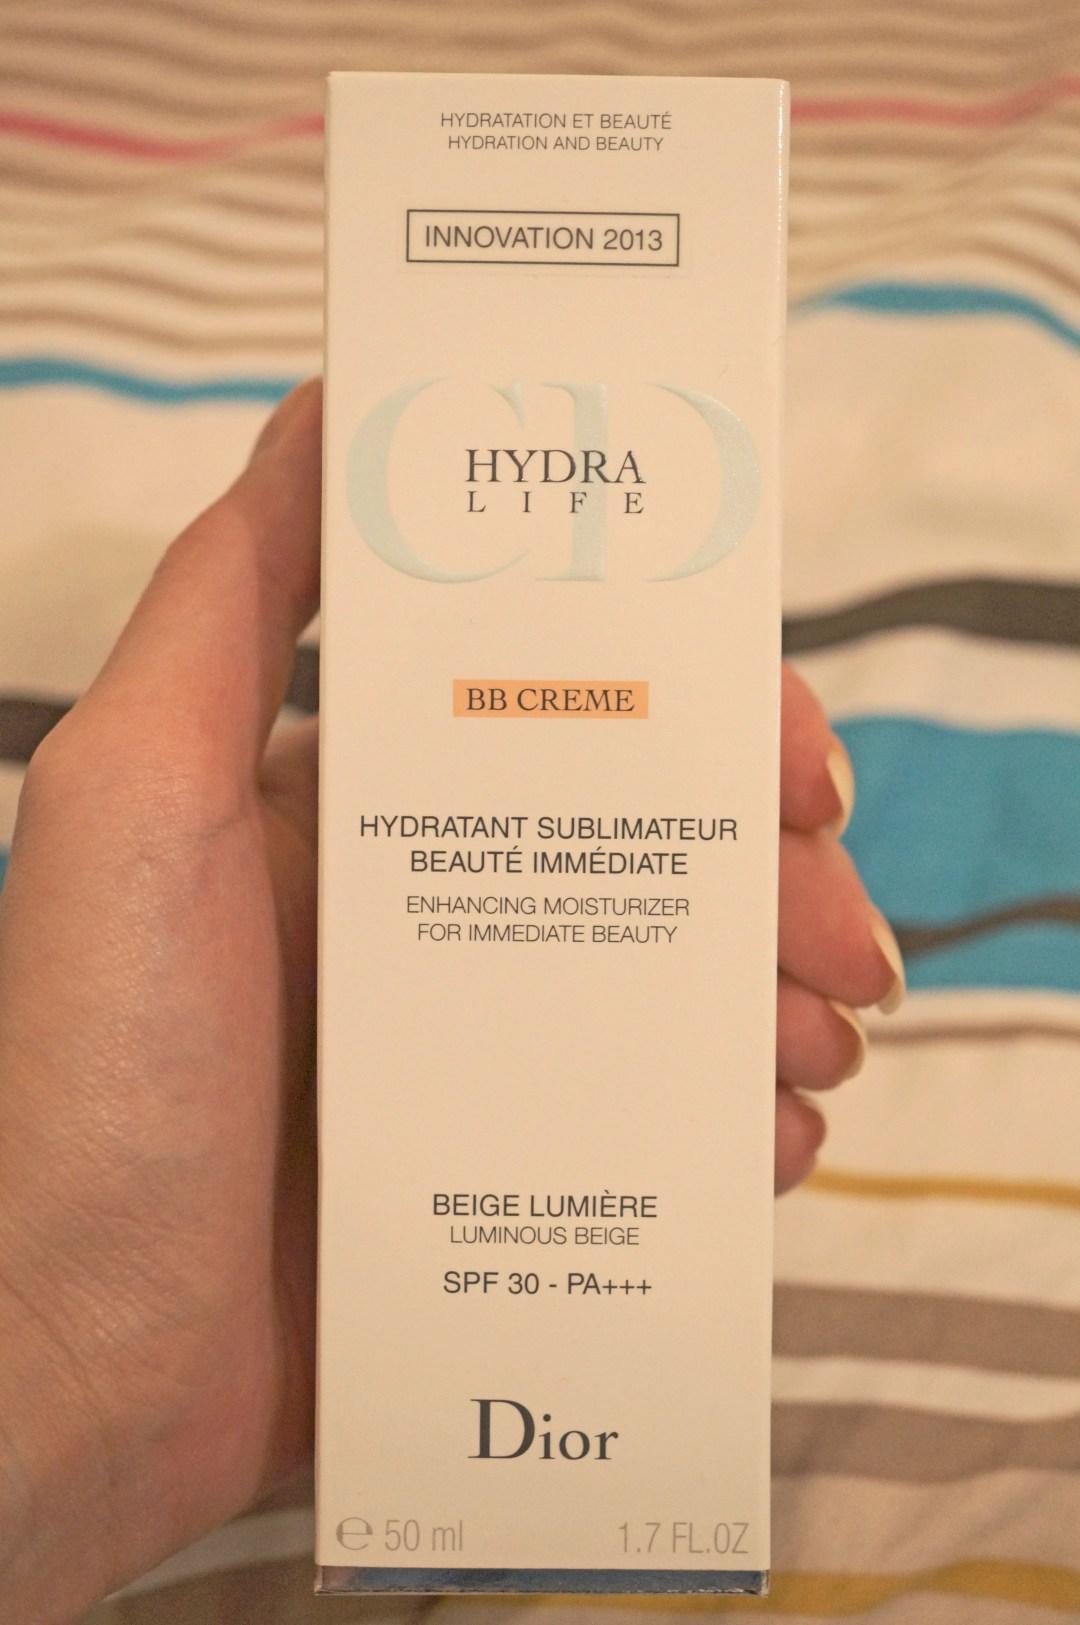 Dior Hydra Lide BB Cream Review